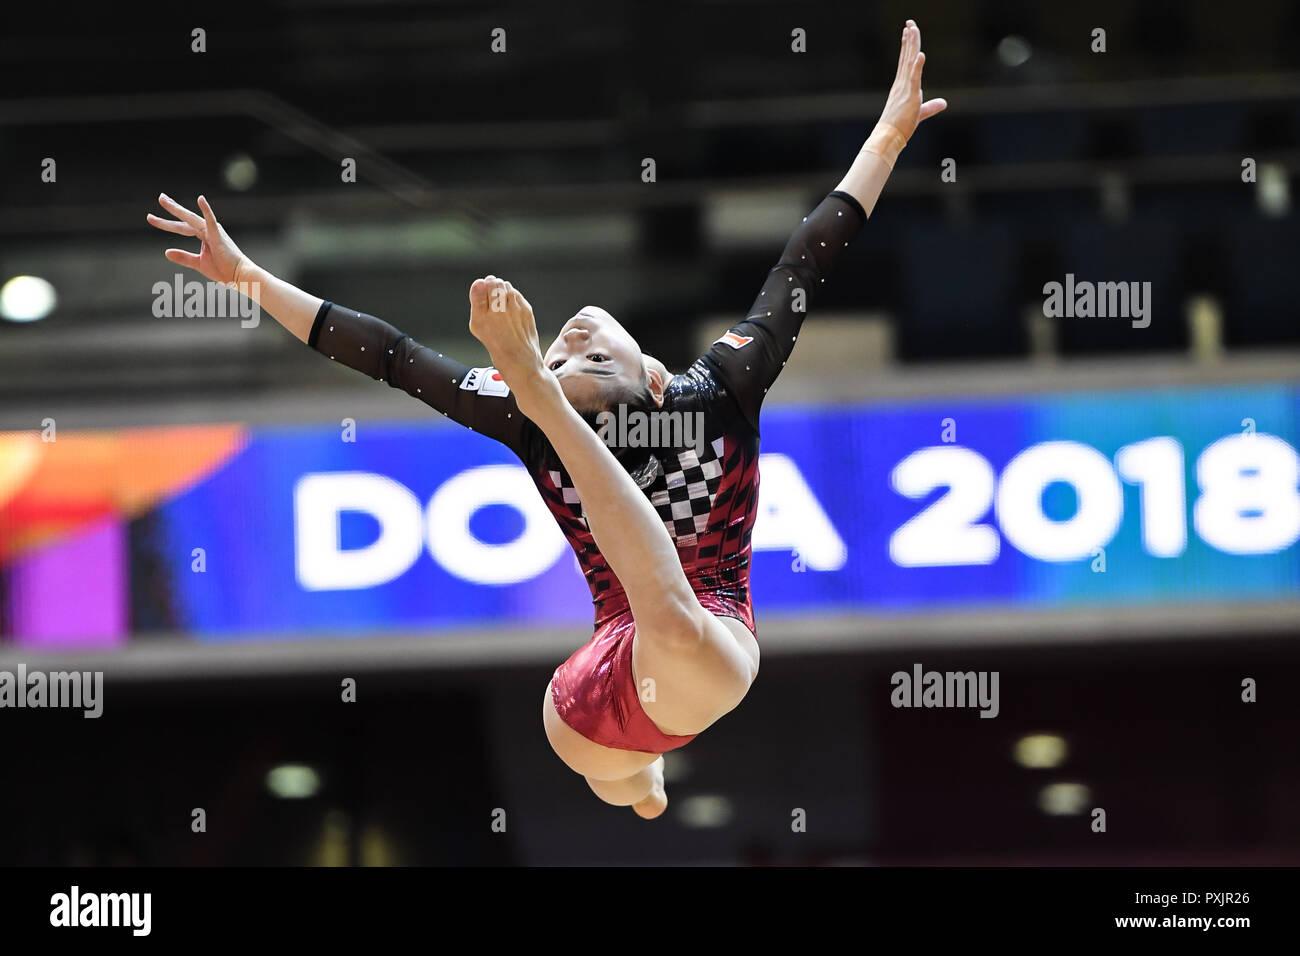 Doha, Qatar  23rd Oct, 2018  AIKO SUGIHARA from Japan does a